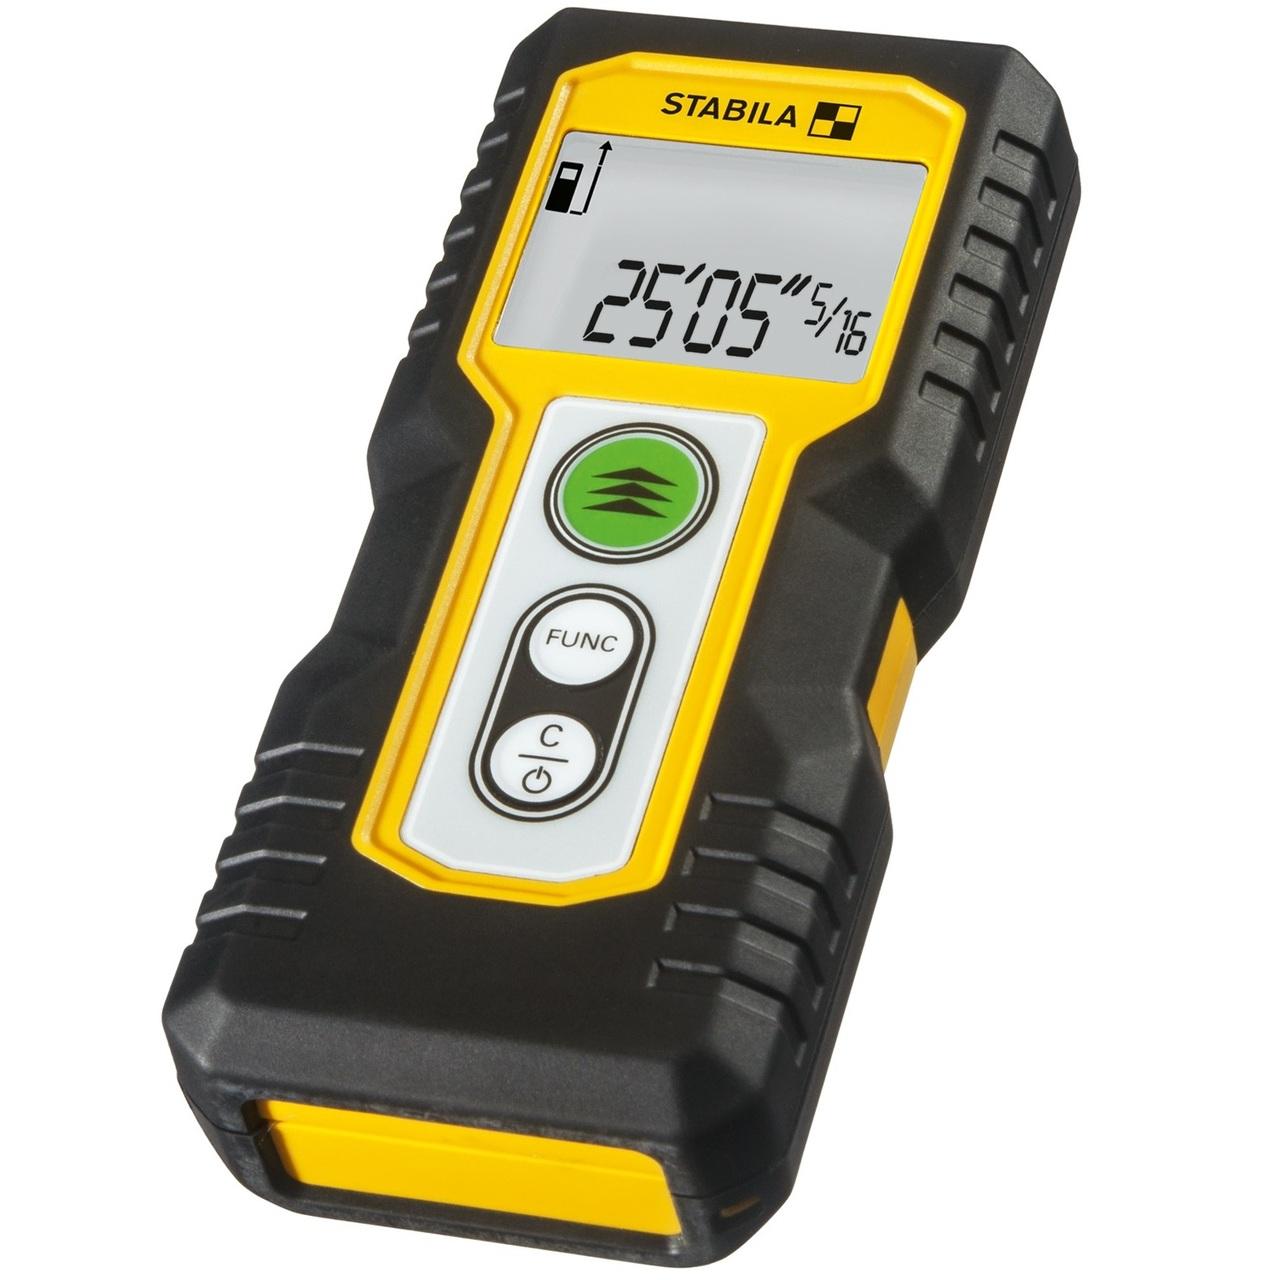 Stabila STAB-06220 LD220 Laser Distance Measure